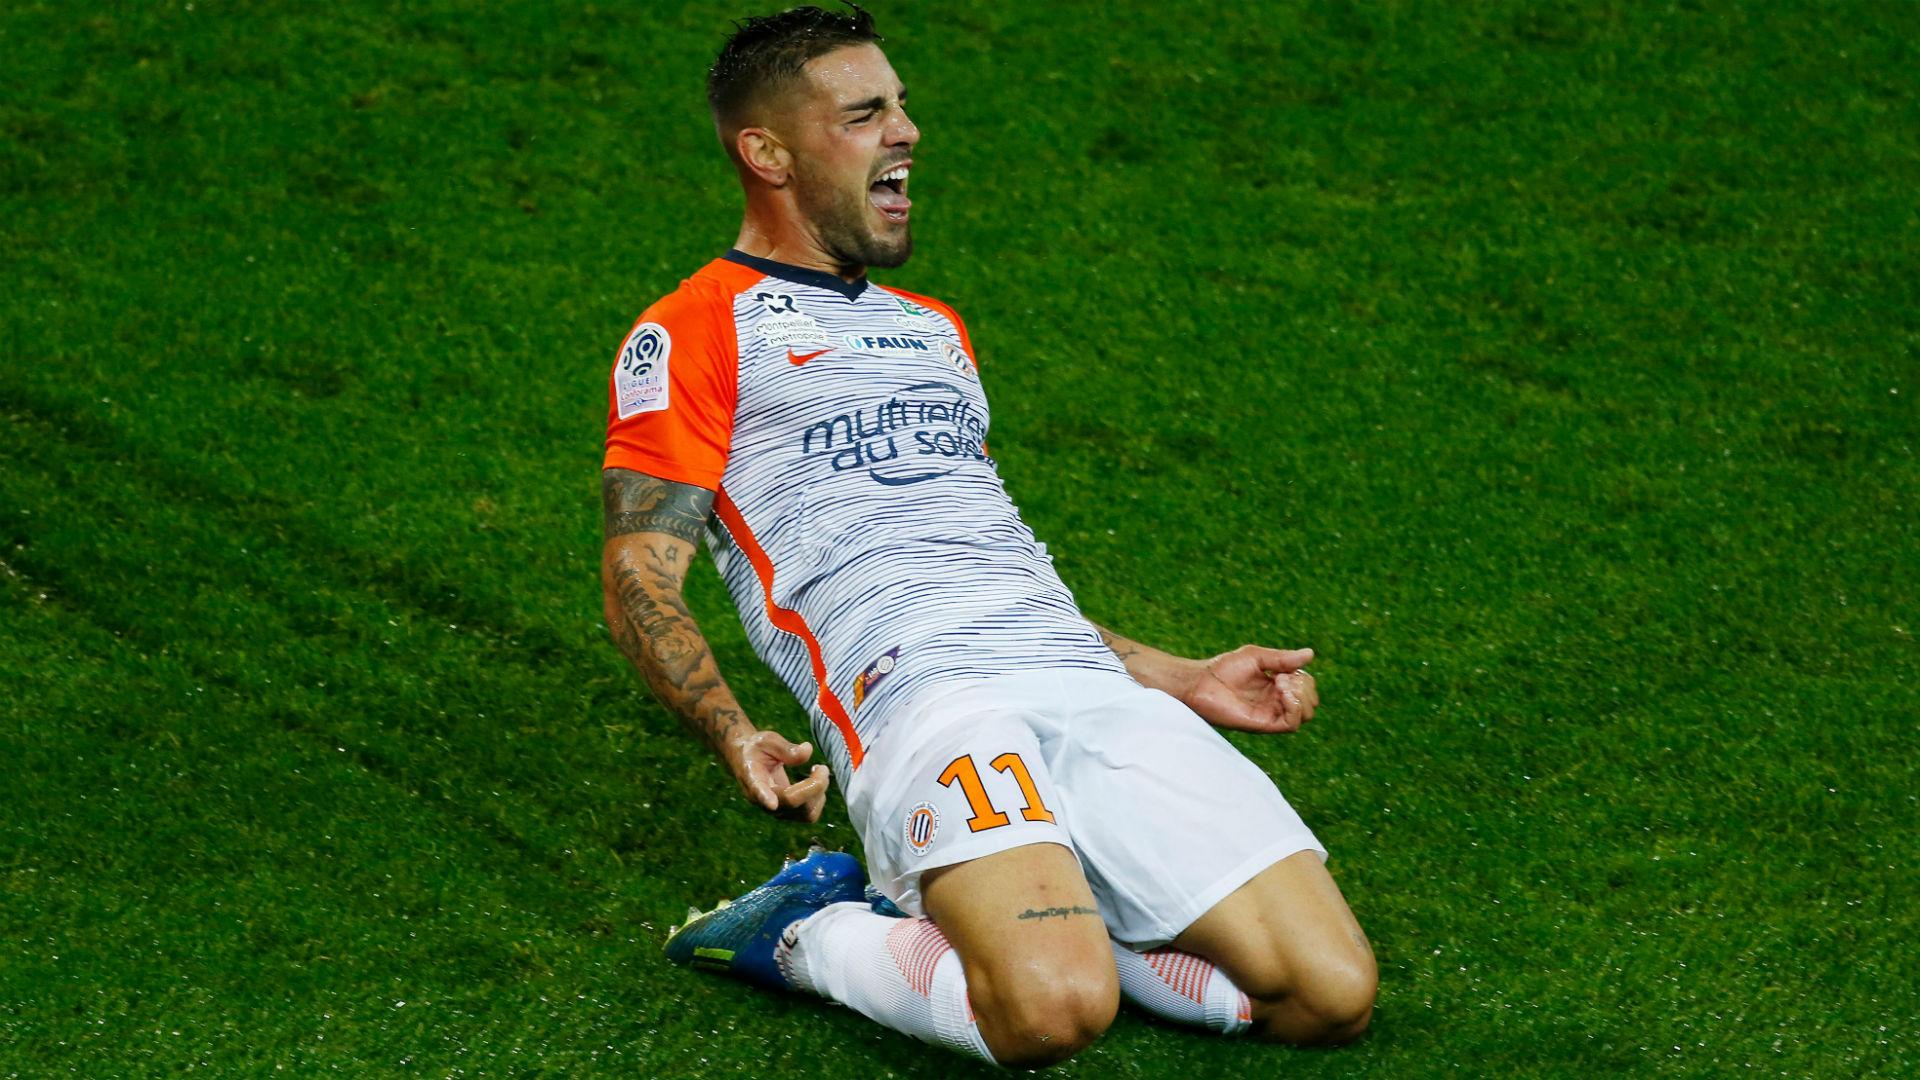 Montpellier striker Andy Delort replaces Haris Belkebla in Algeria's Afcon squad